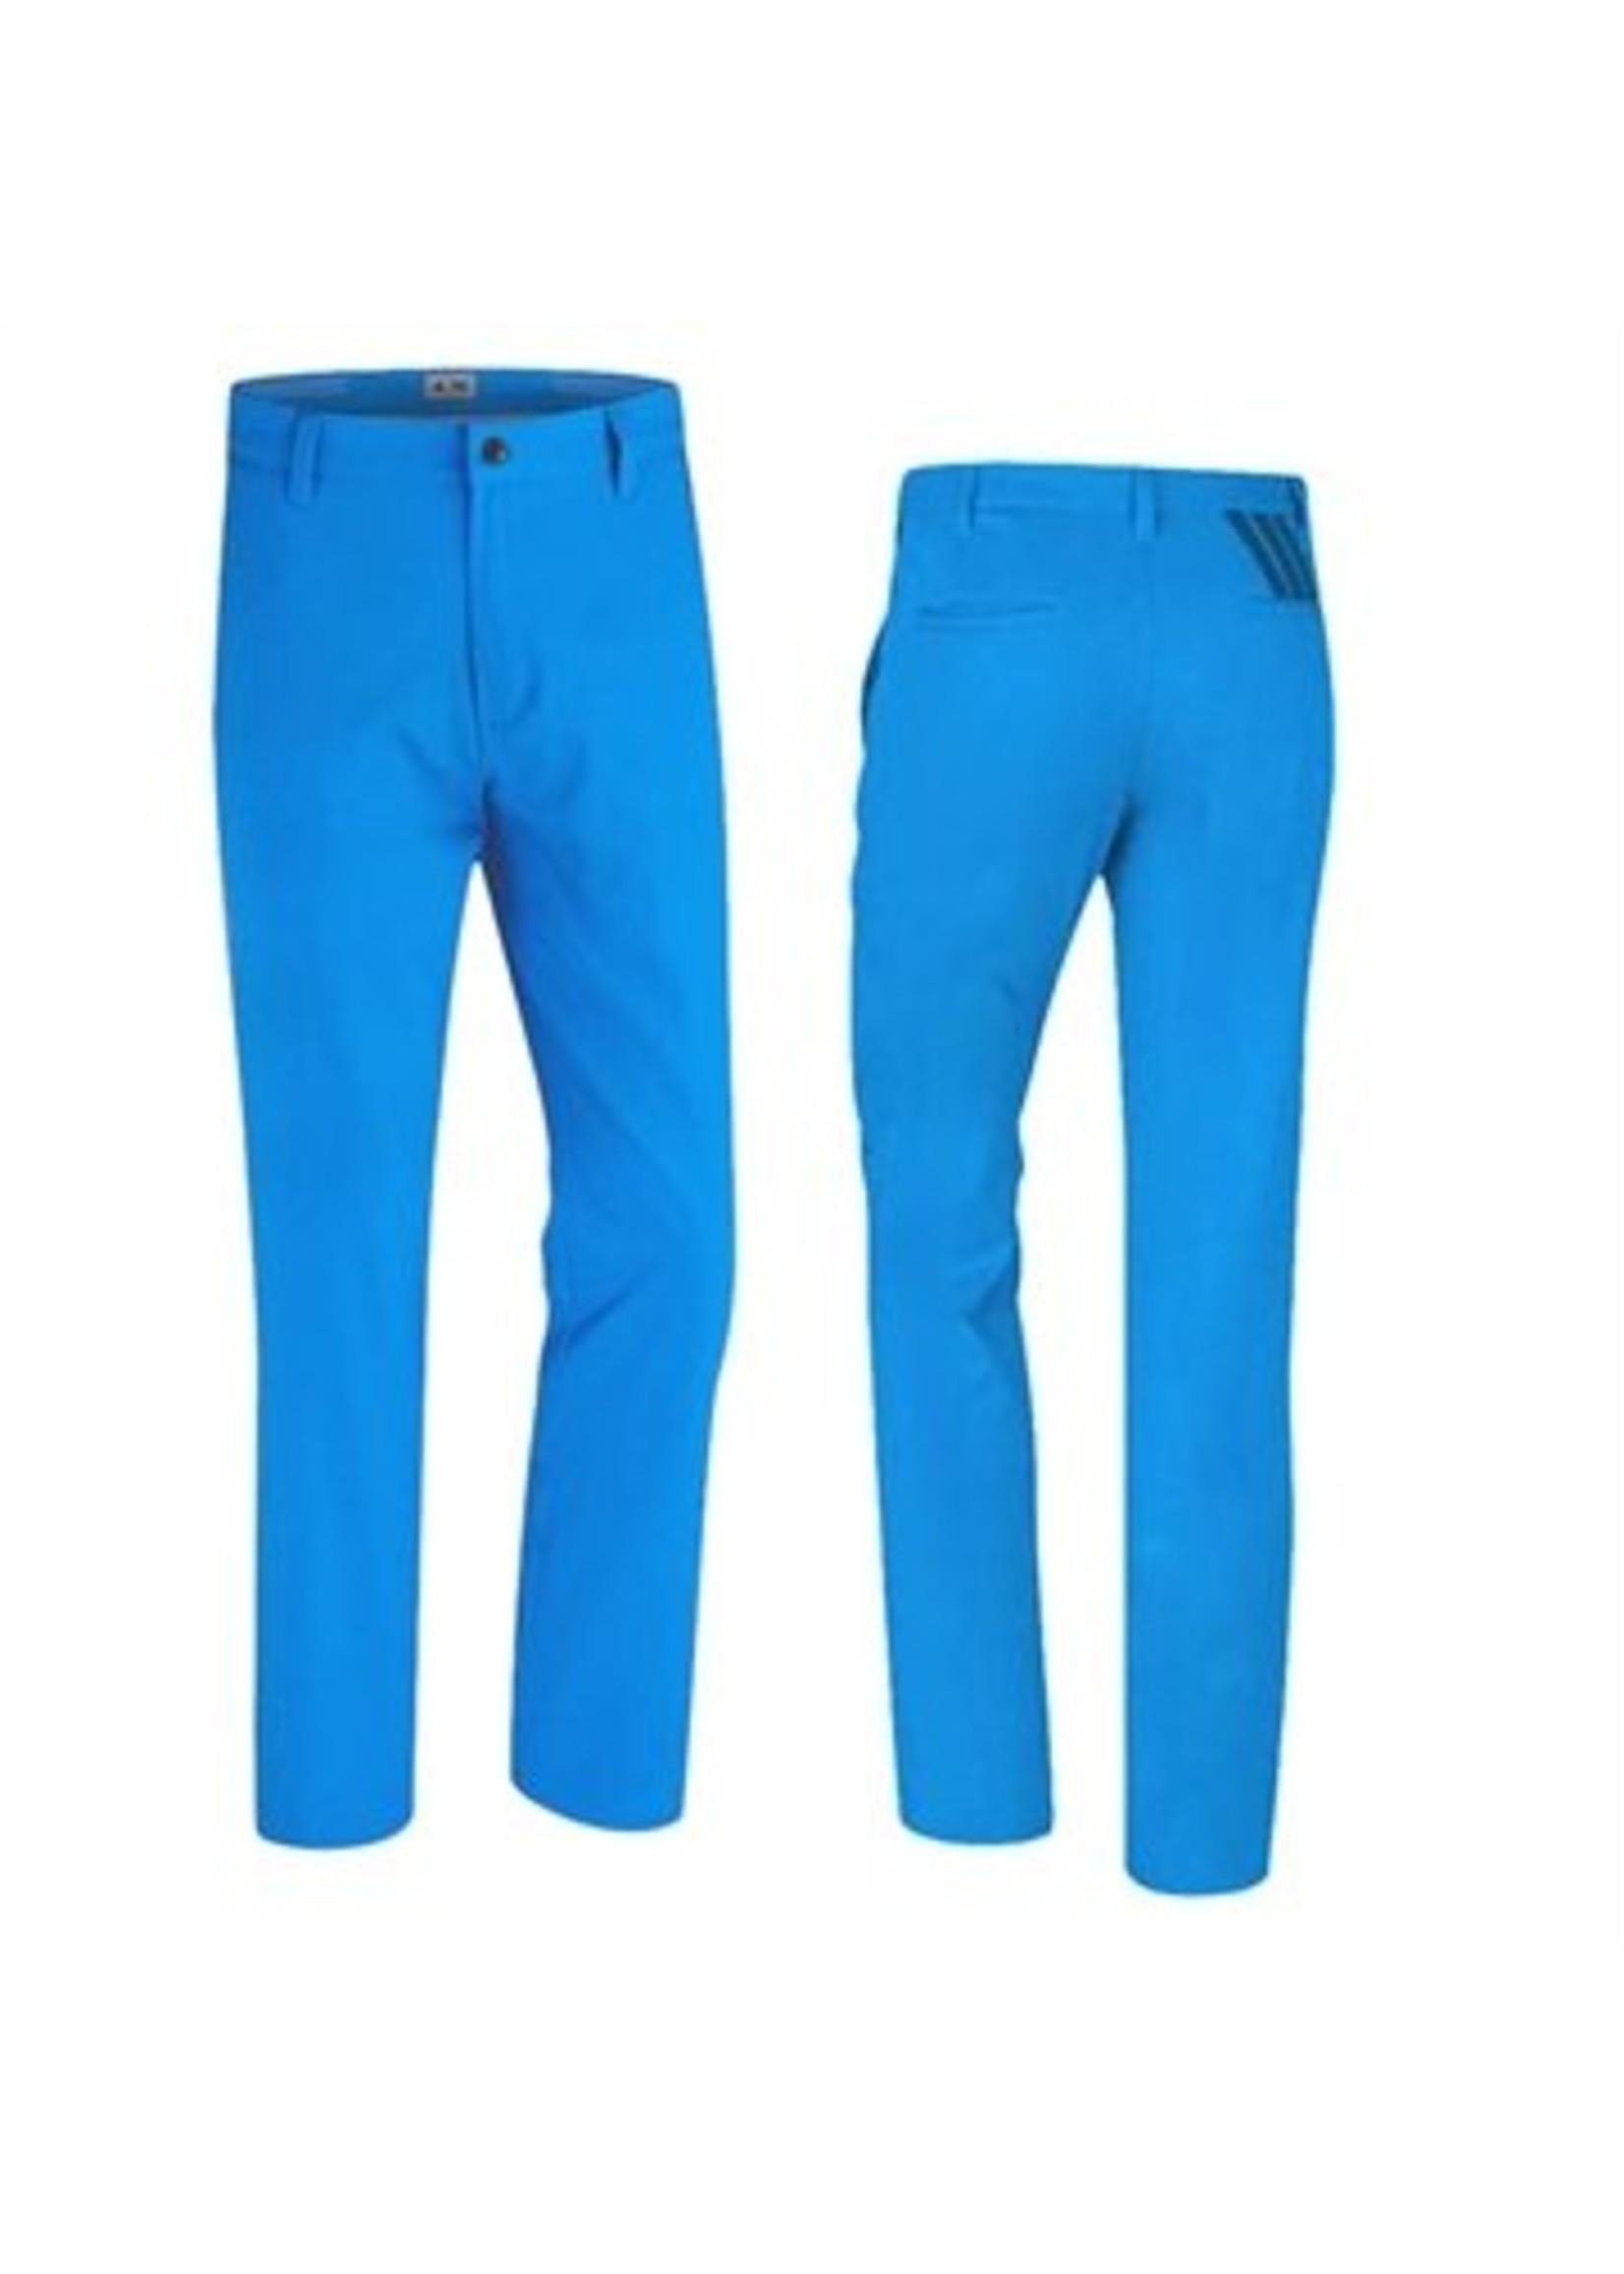 Adidas Adidas Men's Tapered 3 Stripe Golf Trouser